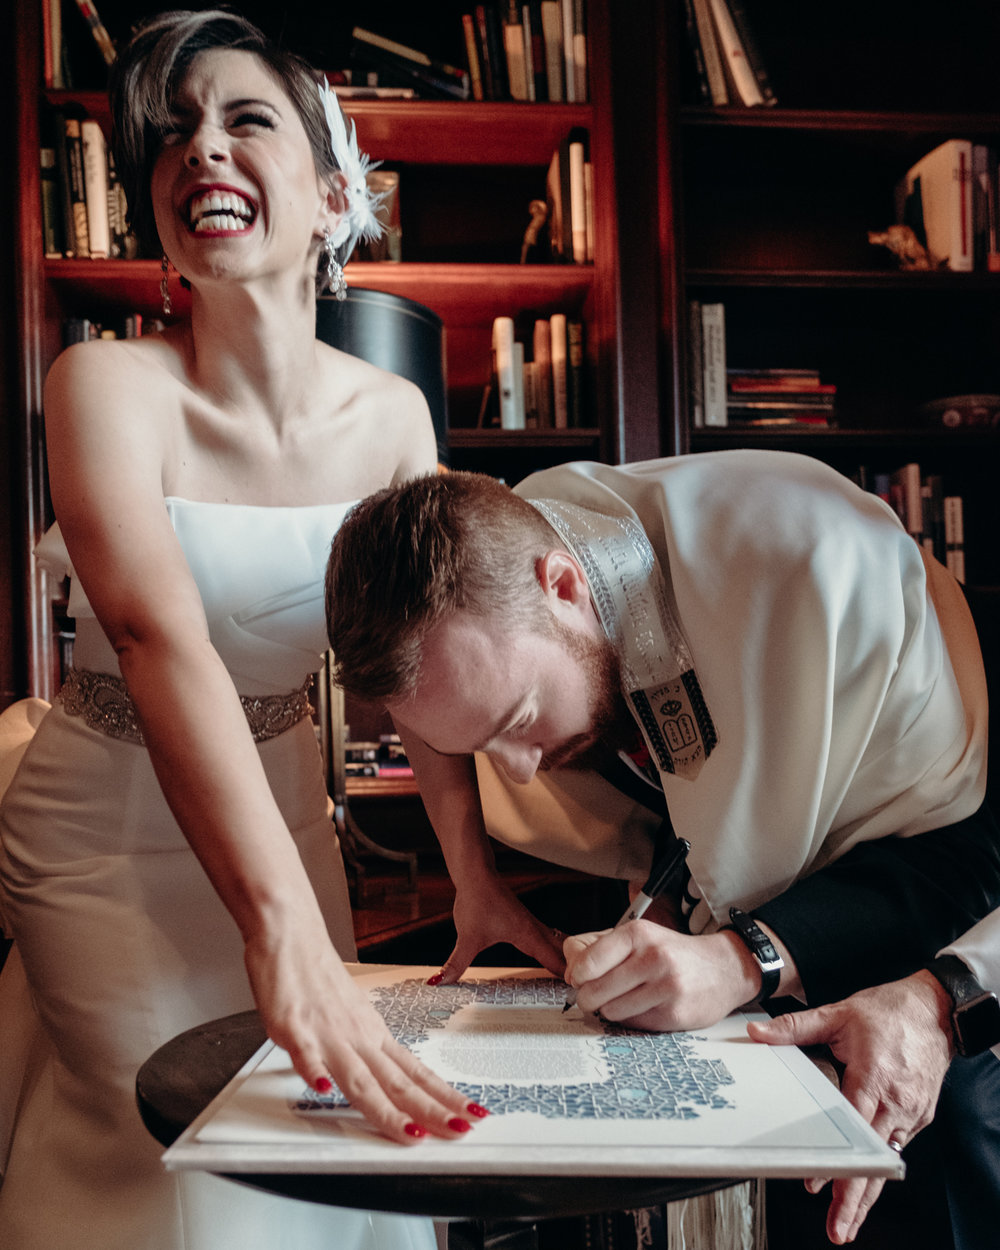 Bride smiles big as groom signs the ketubah at Virginia jewish wedding